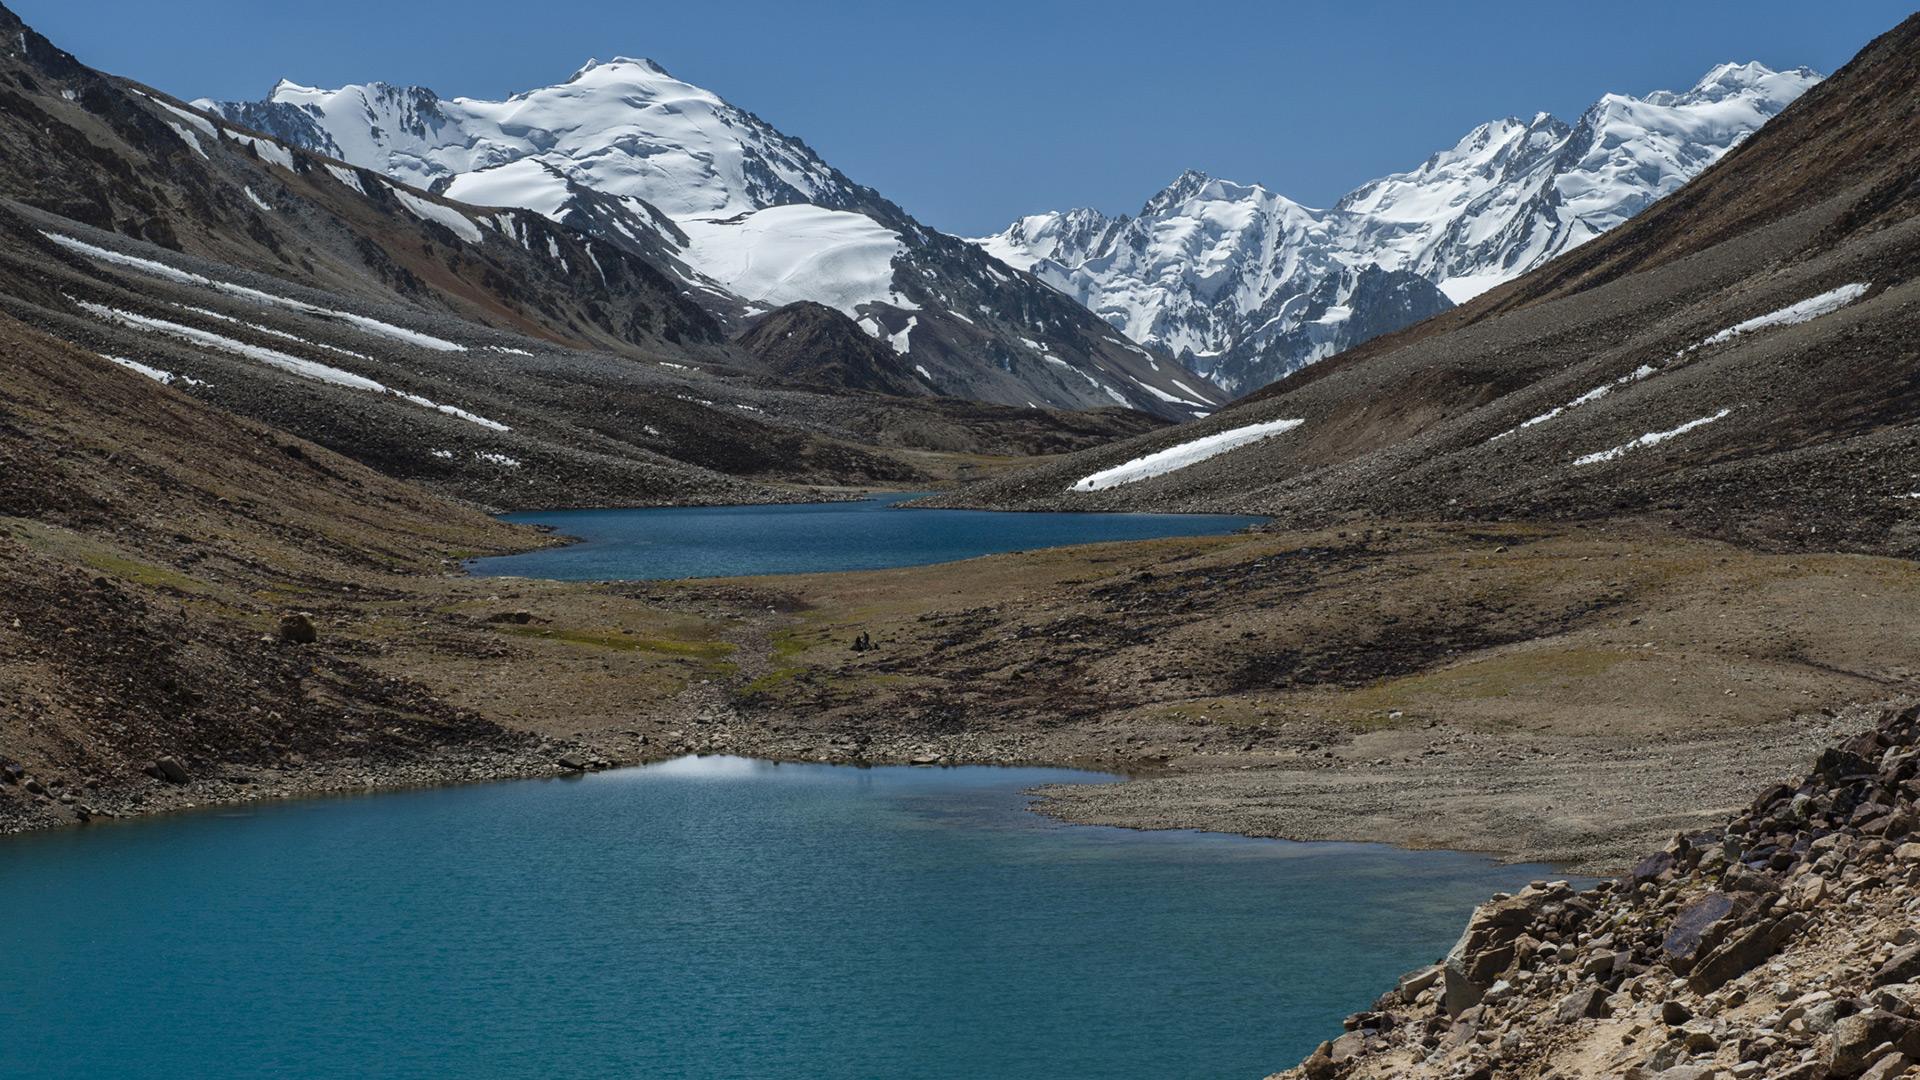 Tajikistan | Sheknows.com